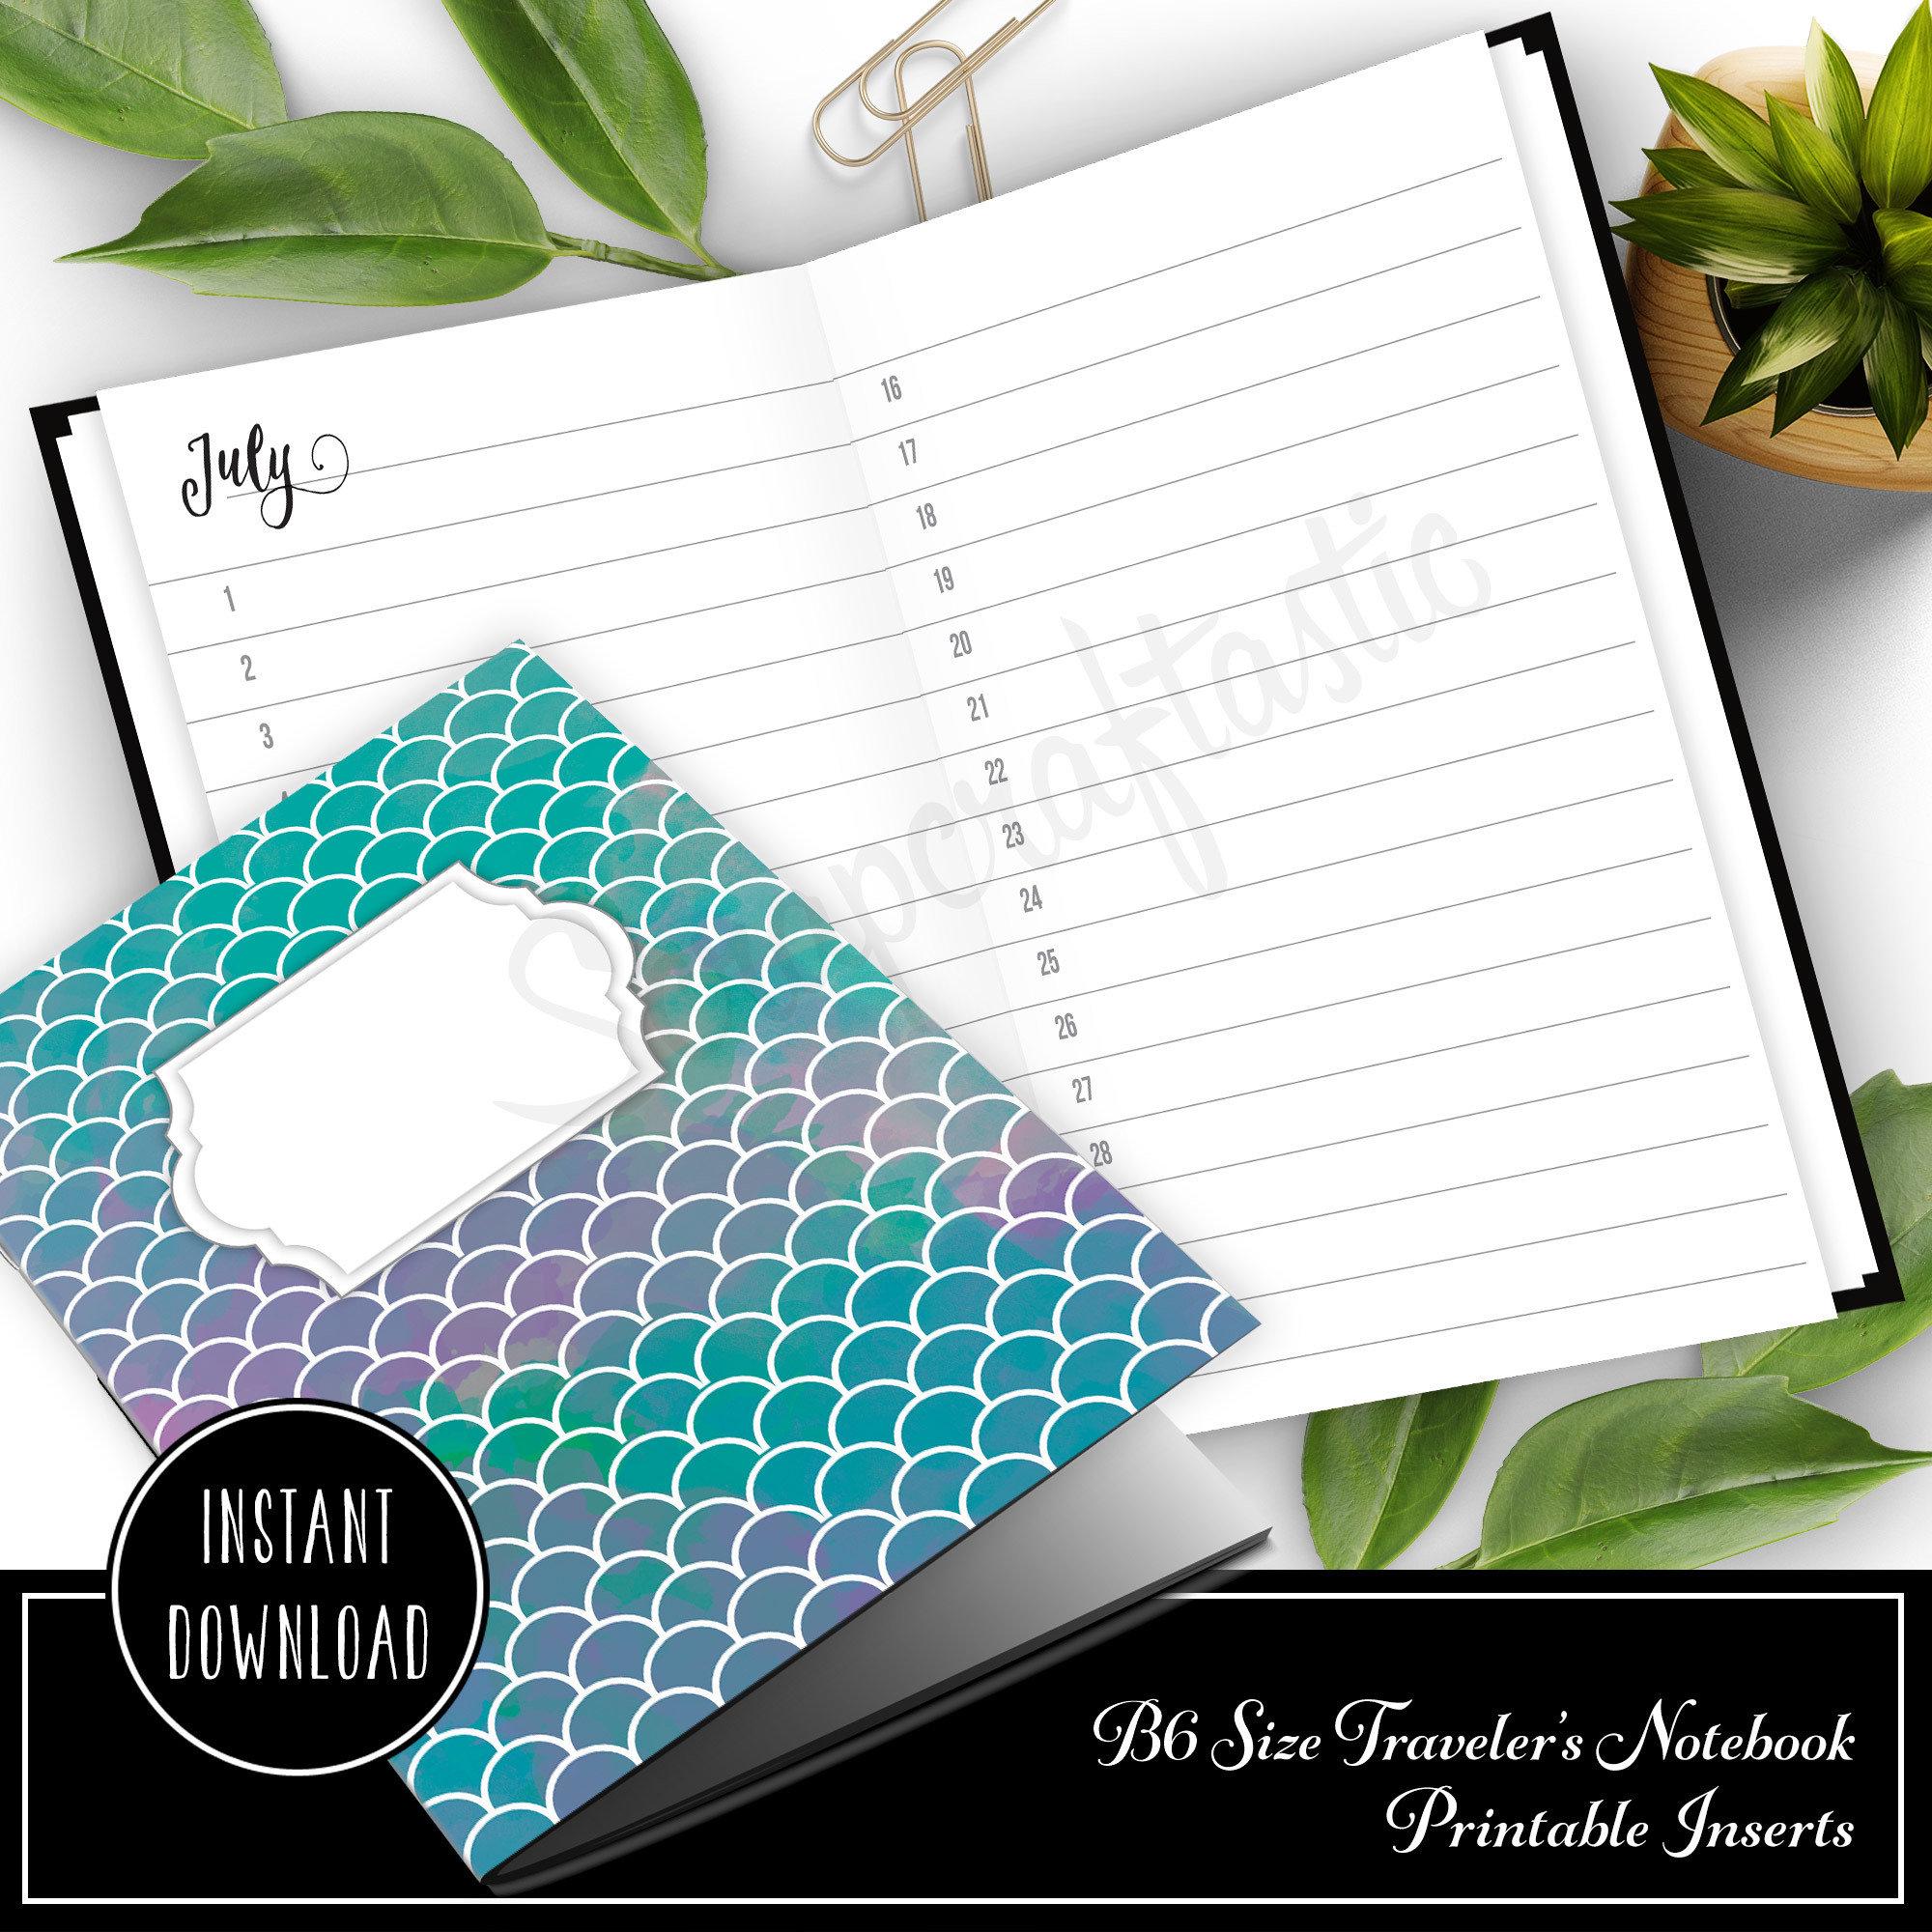 Full Year Notebook: Horizontal Month List B6 Printable Traveler's Notebook Insert 50012